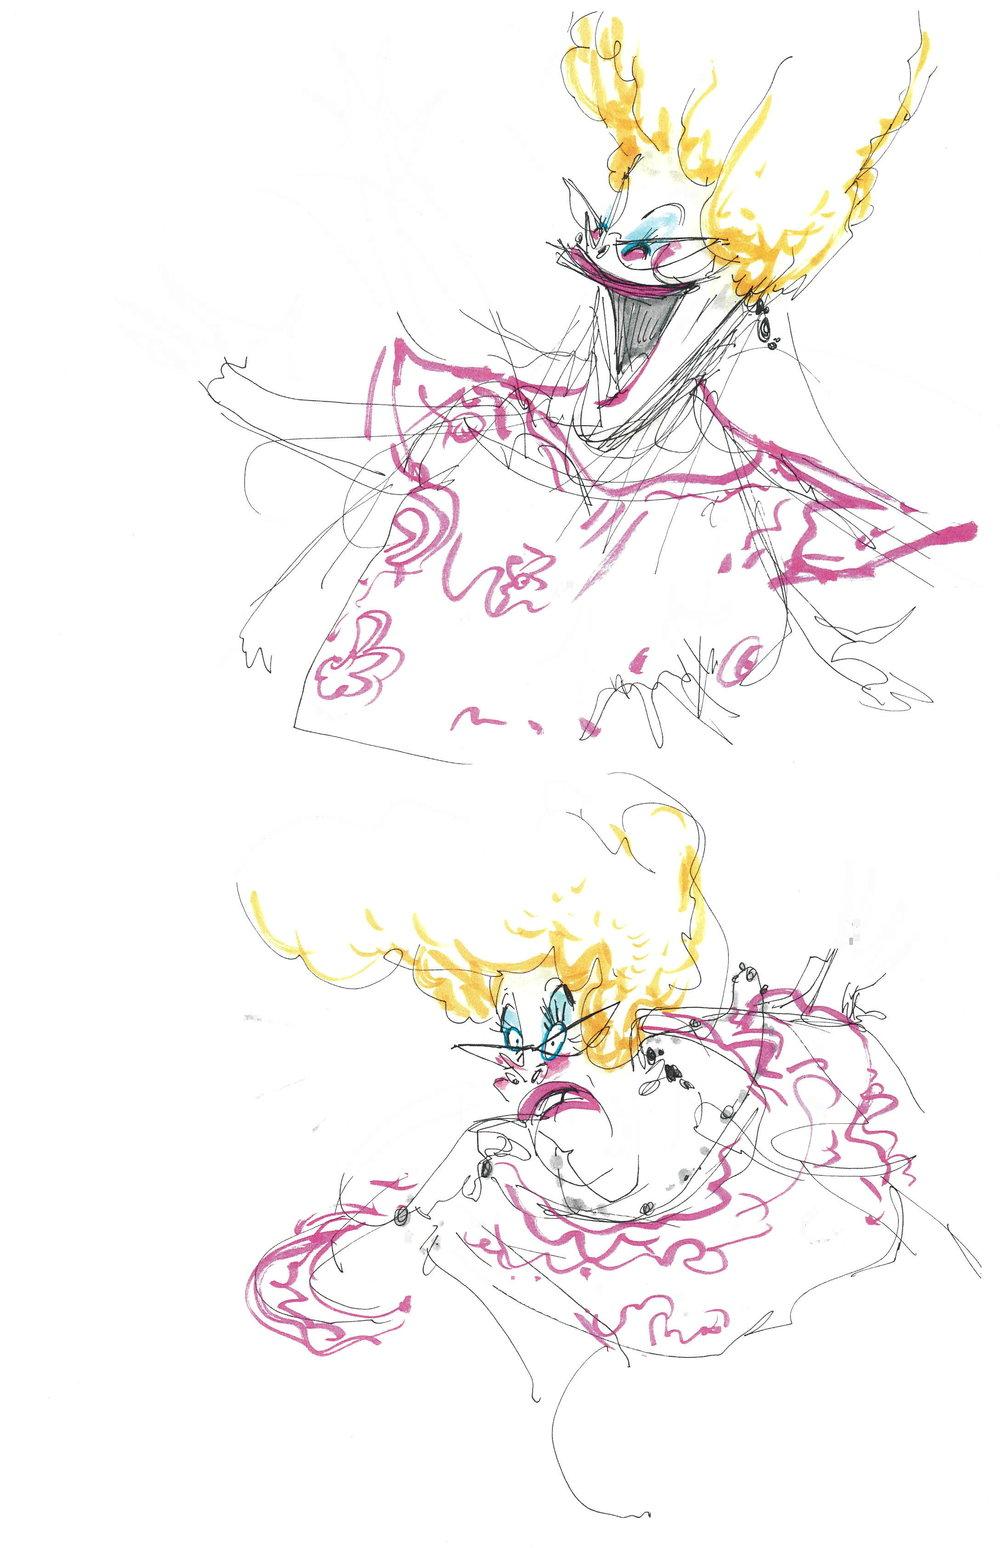 BRIANWONDERS-sketches-1_Page_12_Image_0001.jpg